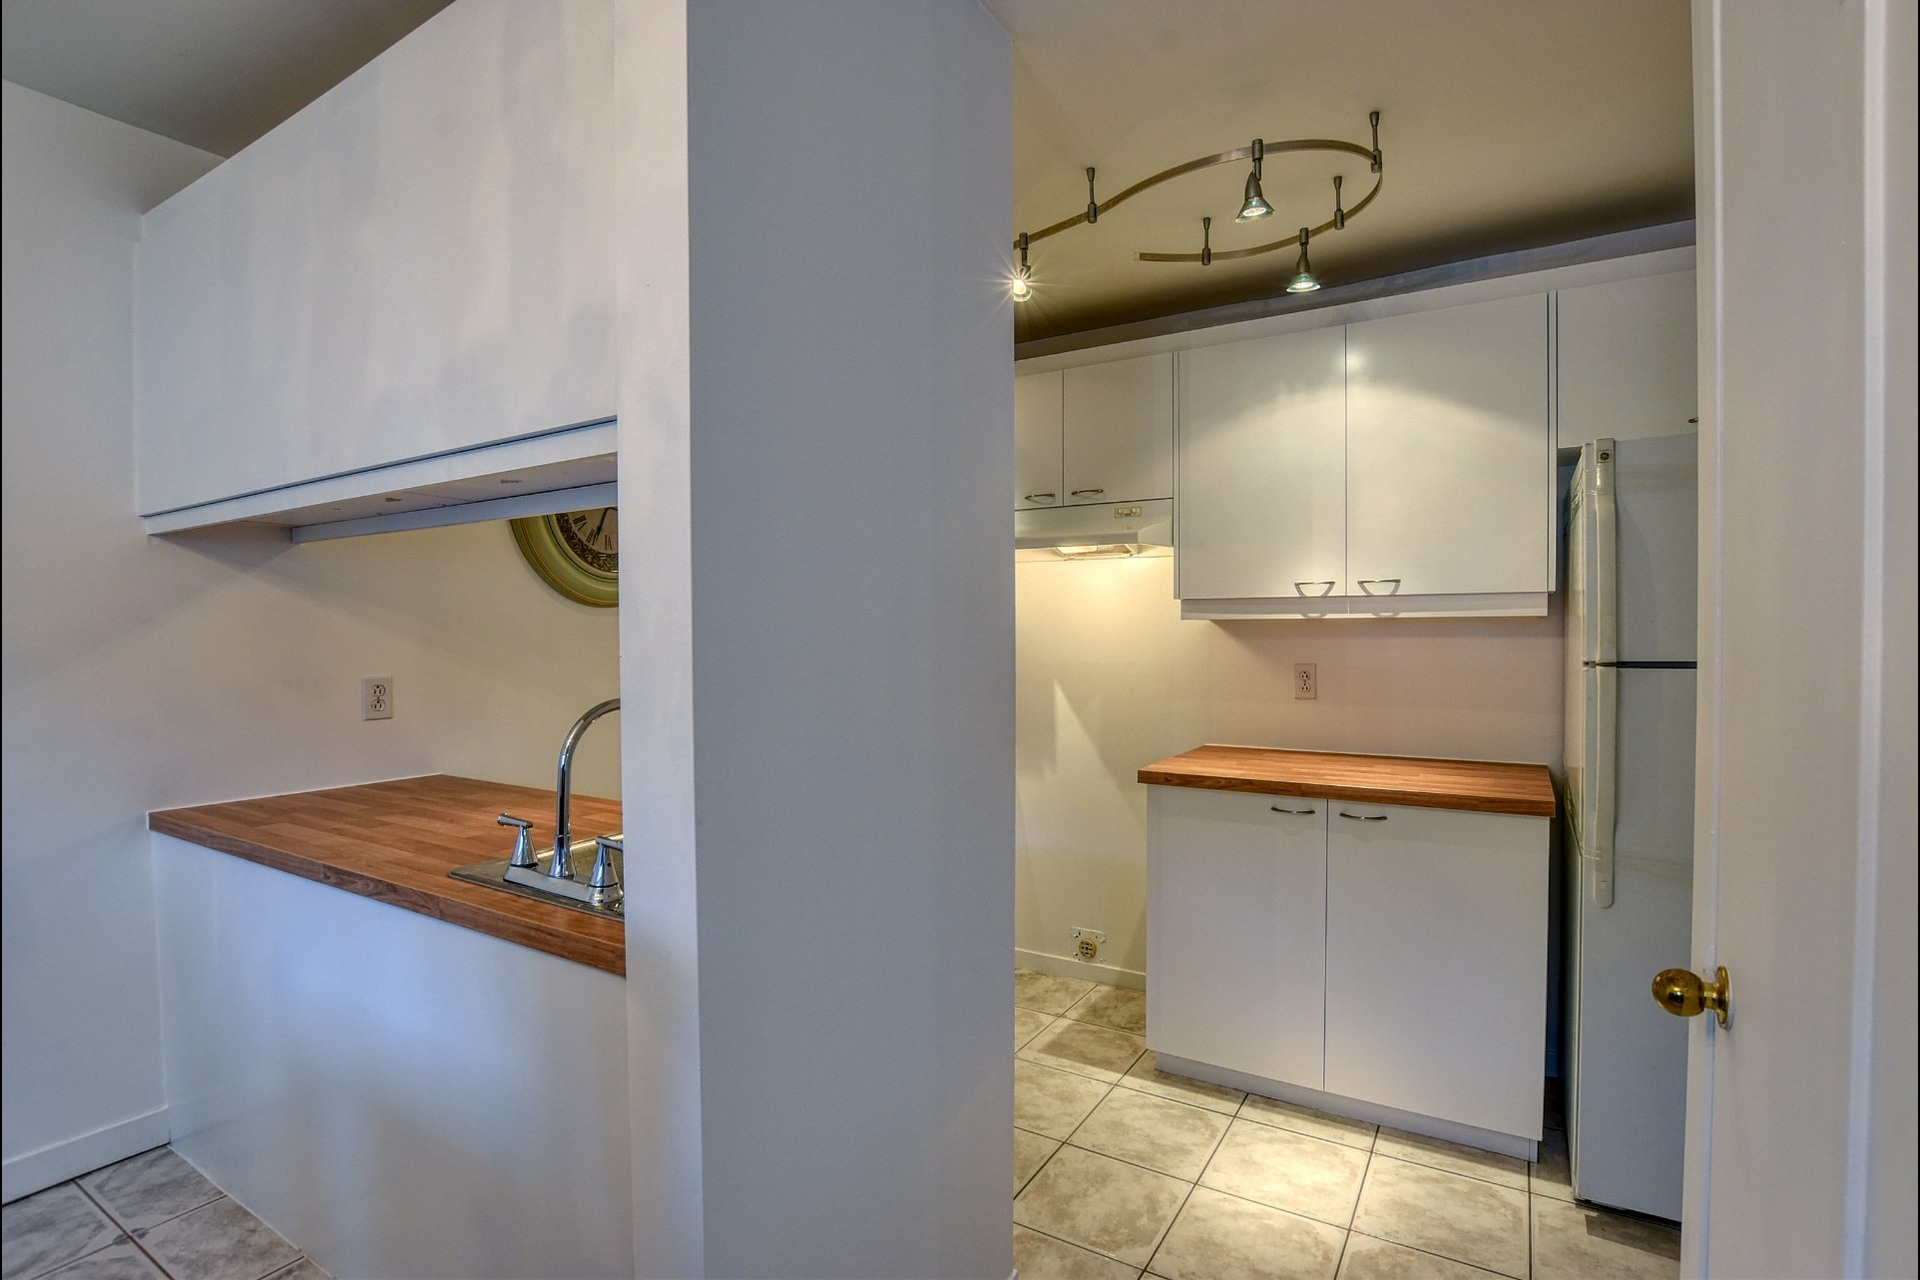 image 8 - Apartment For sale Repentigny Repentigny  - 5 rooms